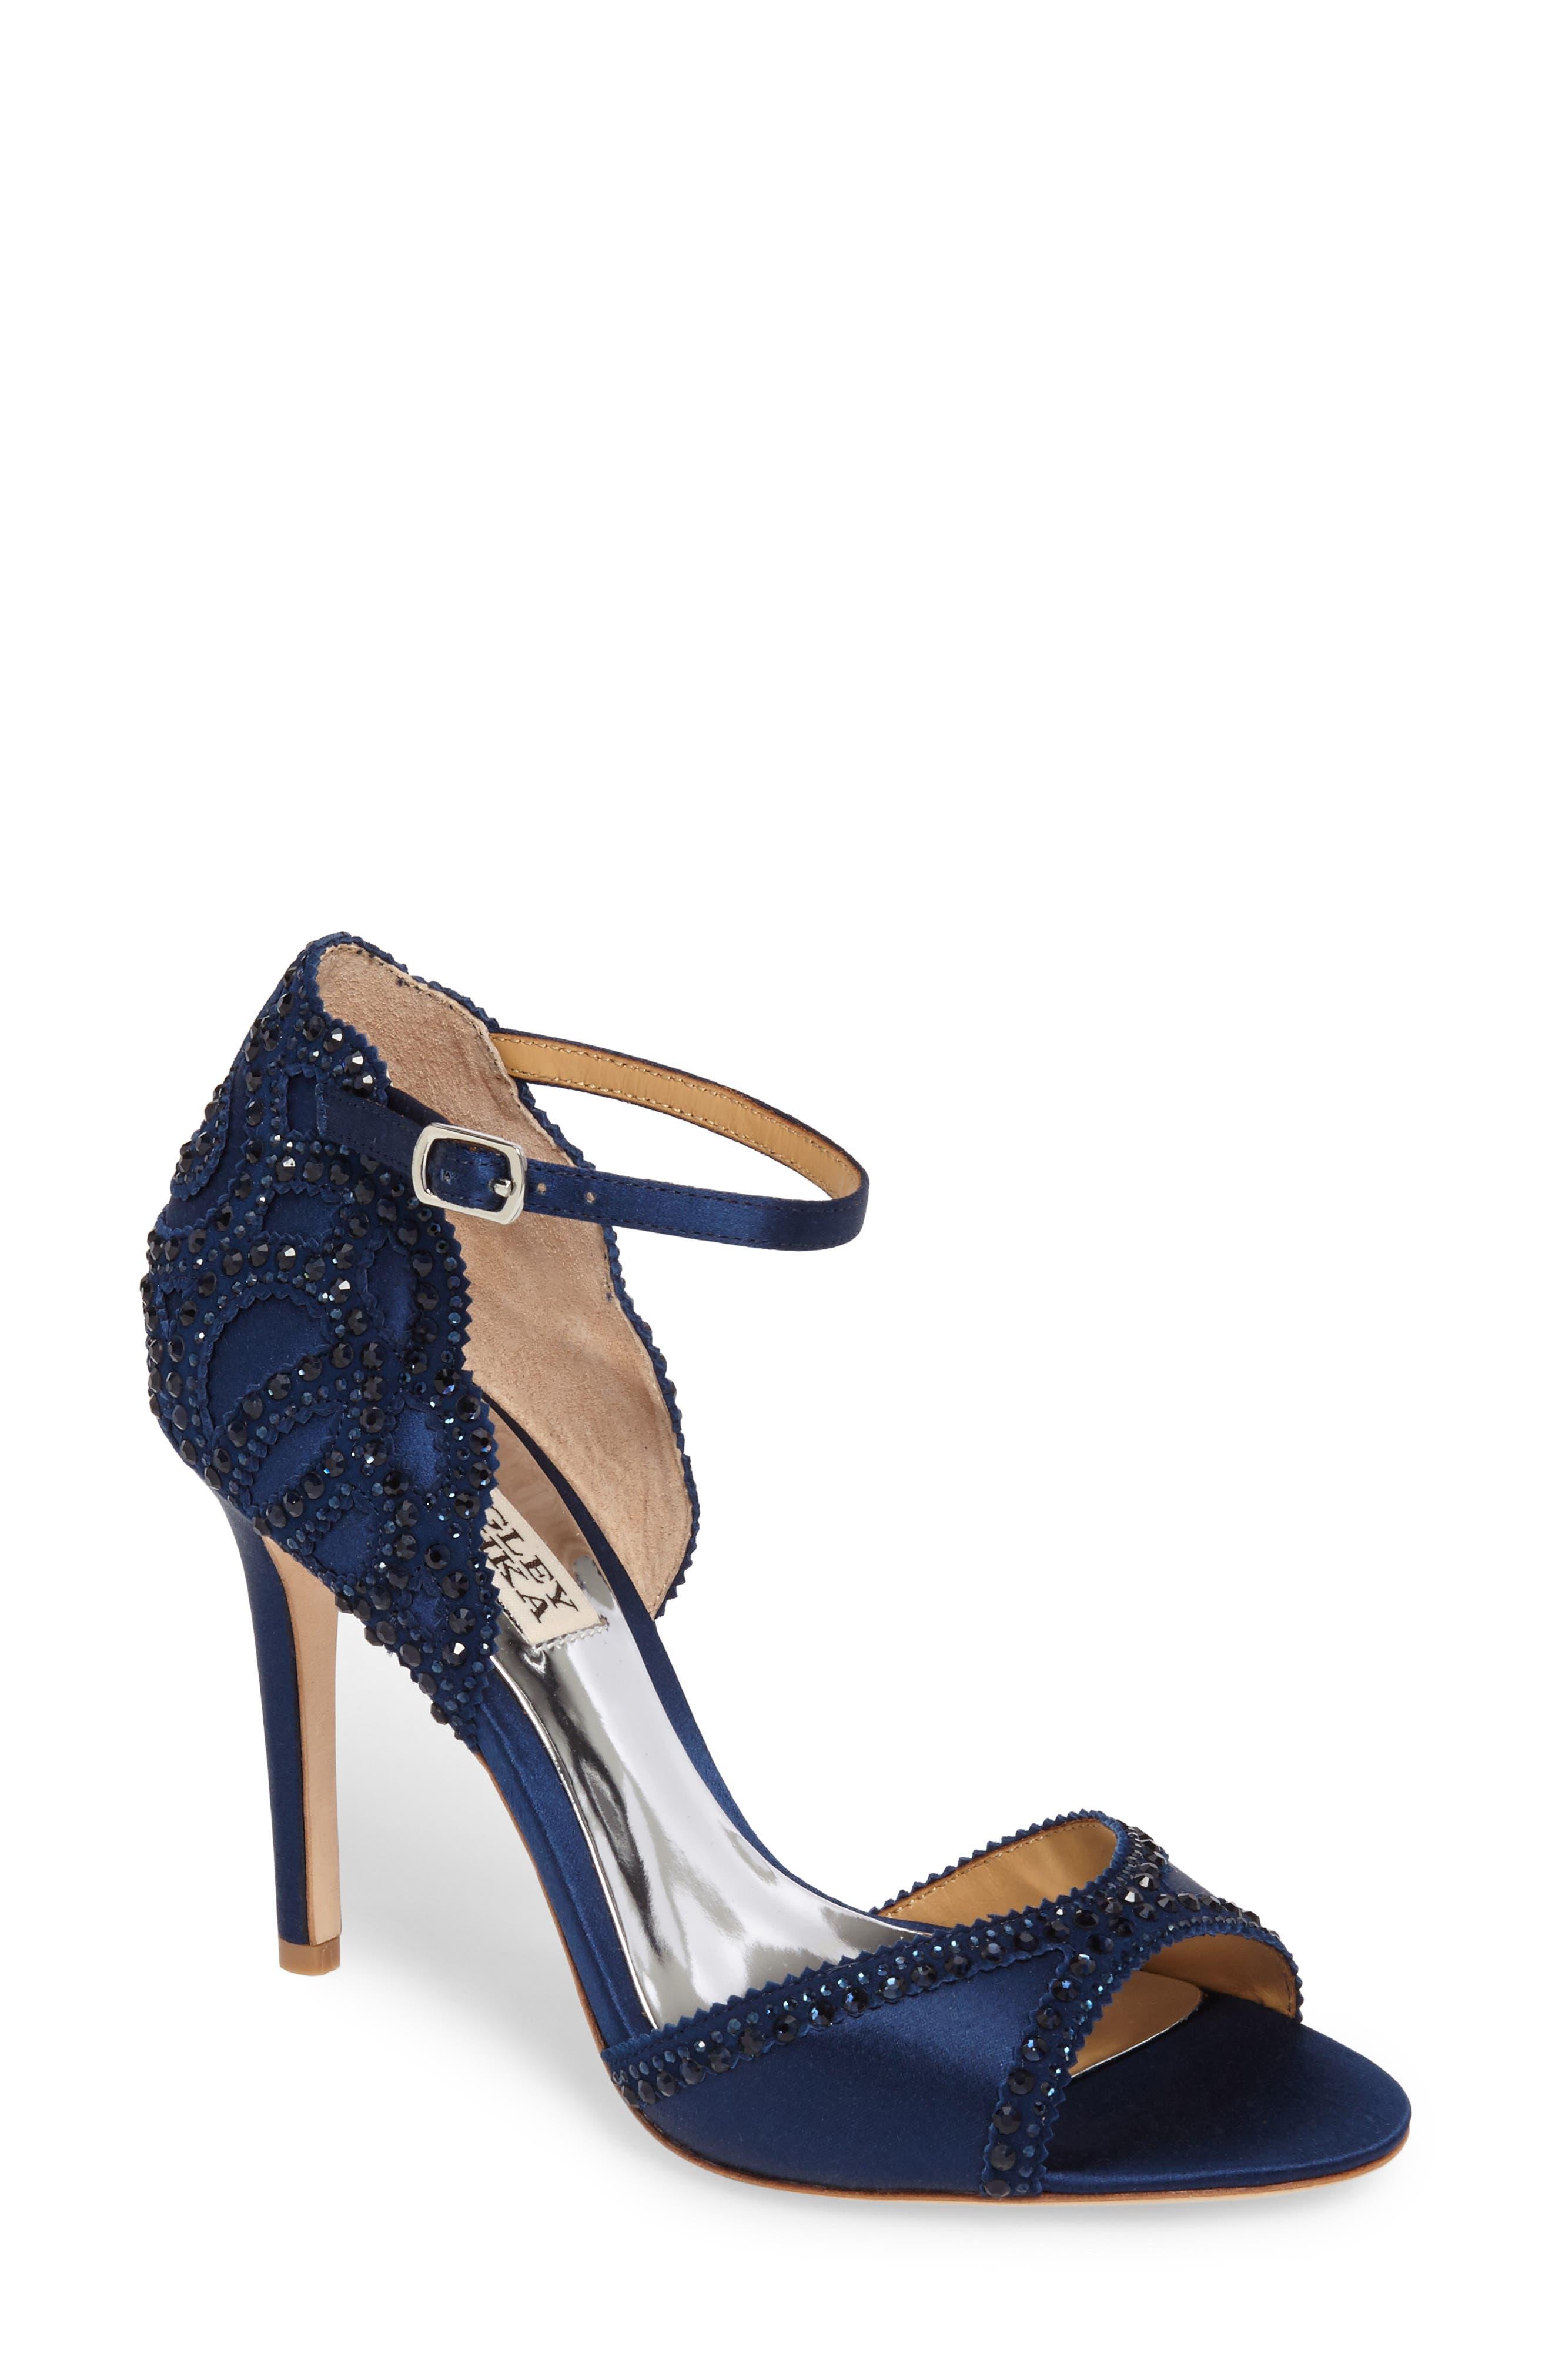 Main Image - Badgley Mischka 'Roxy' Sandal (Women)